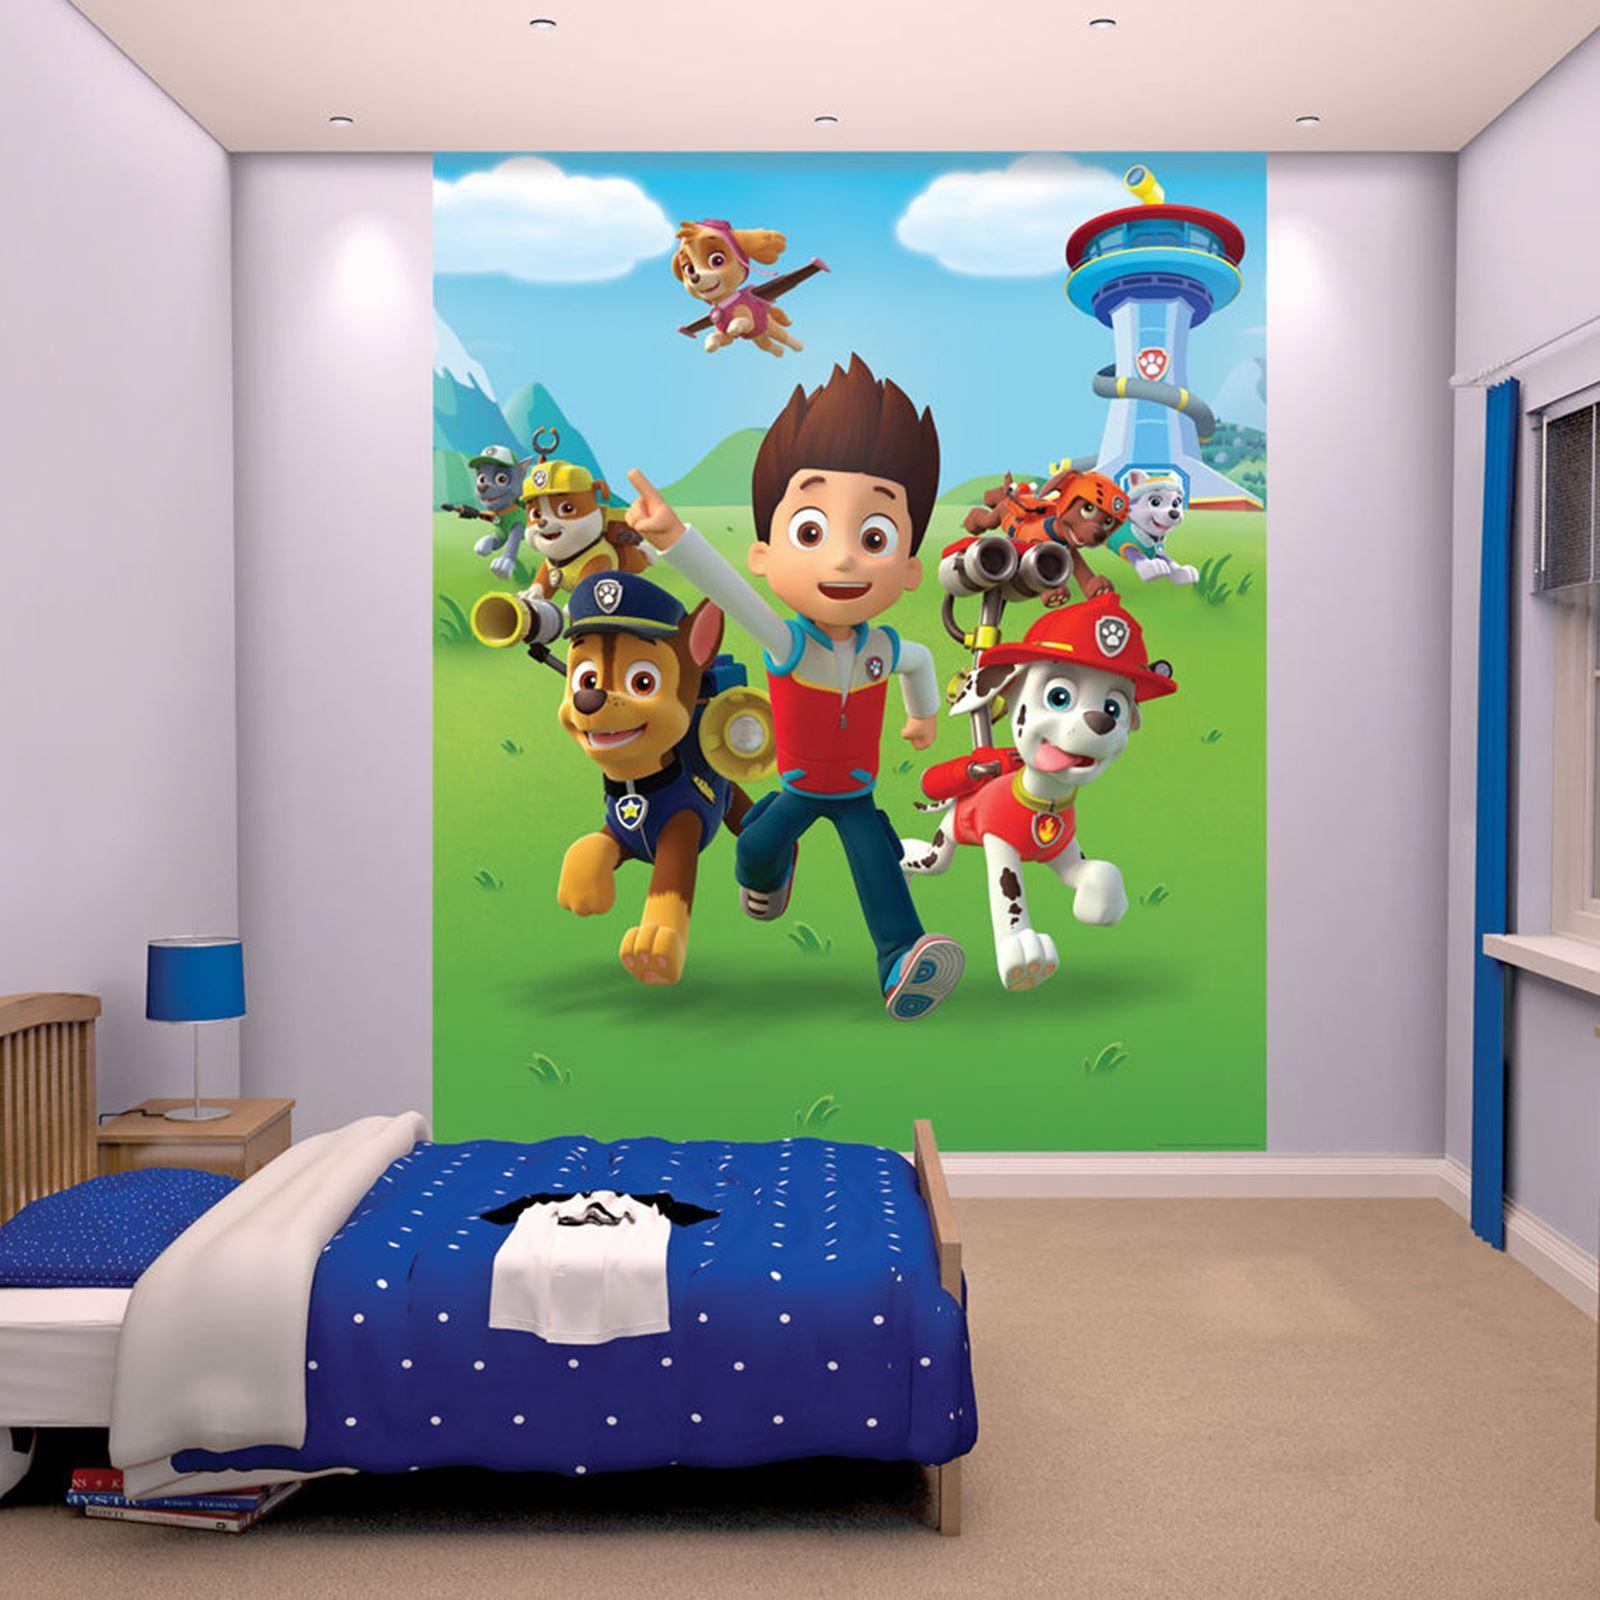 Walltastic wallpaper wall murals kids bedroom peppa avengers thomas more - Avengers bedroom ...